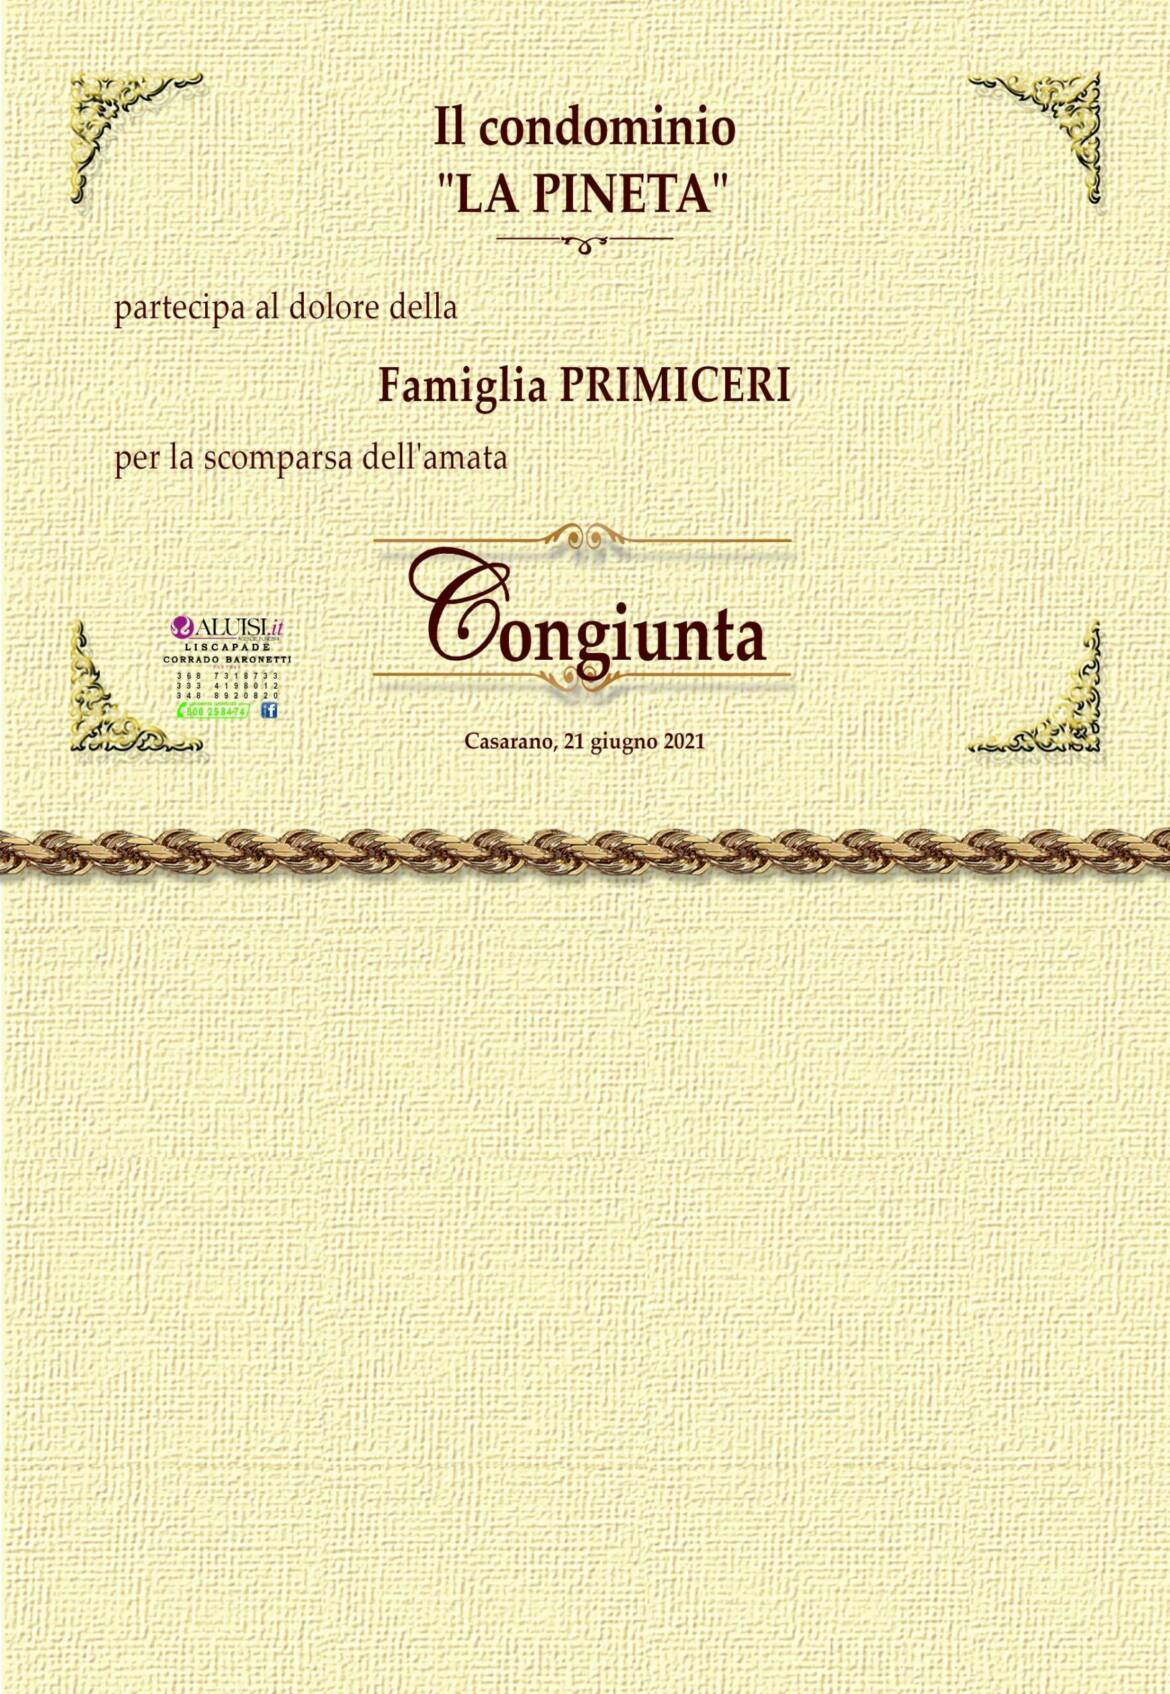 PARTECIPAZION-ANTONIA-de-luca-scaled.jpg